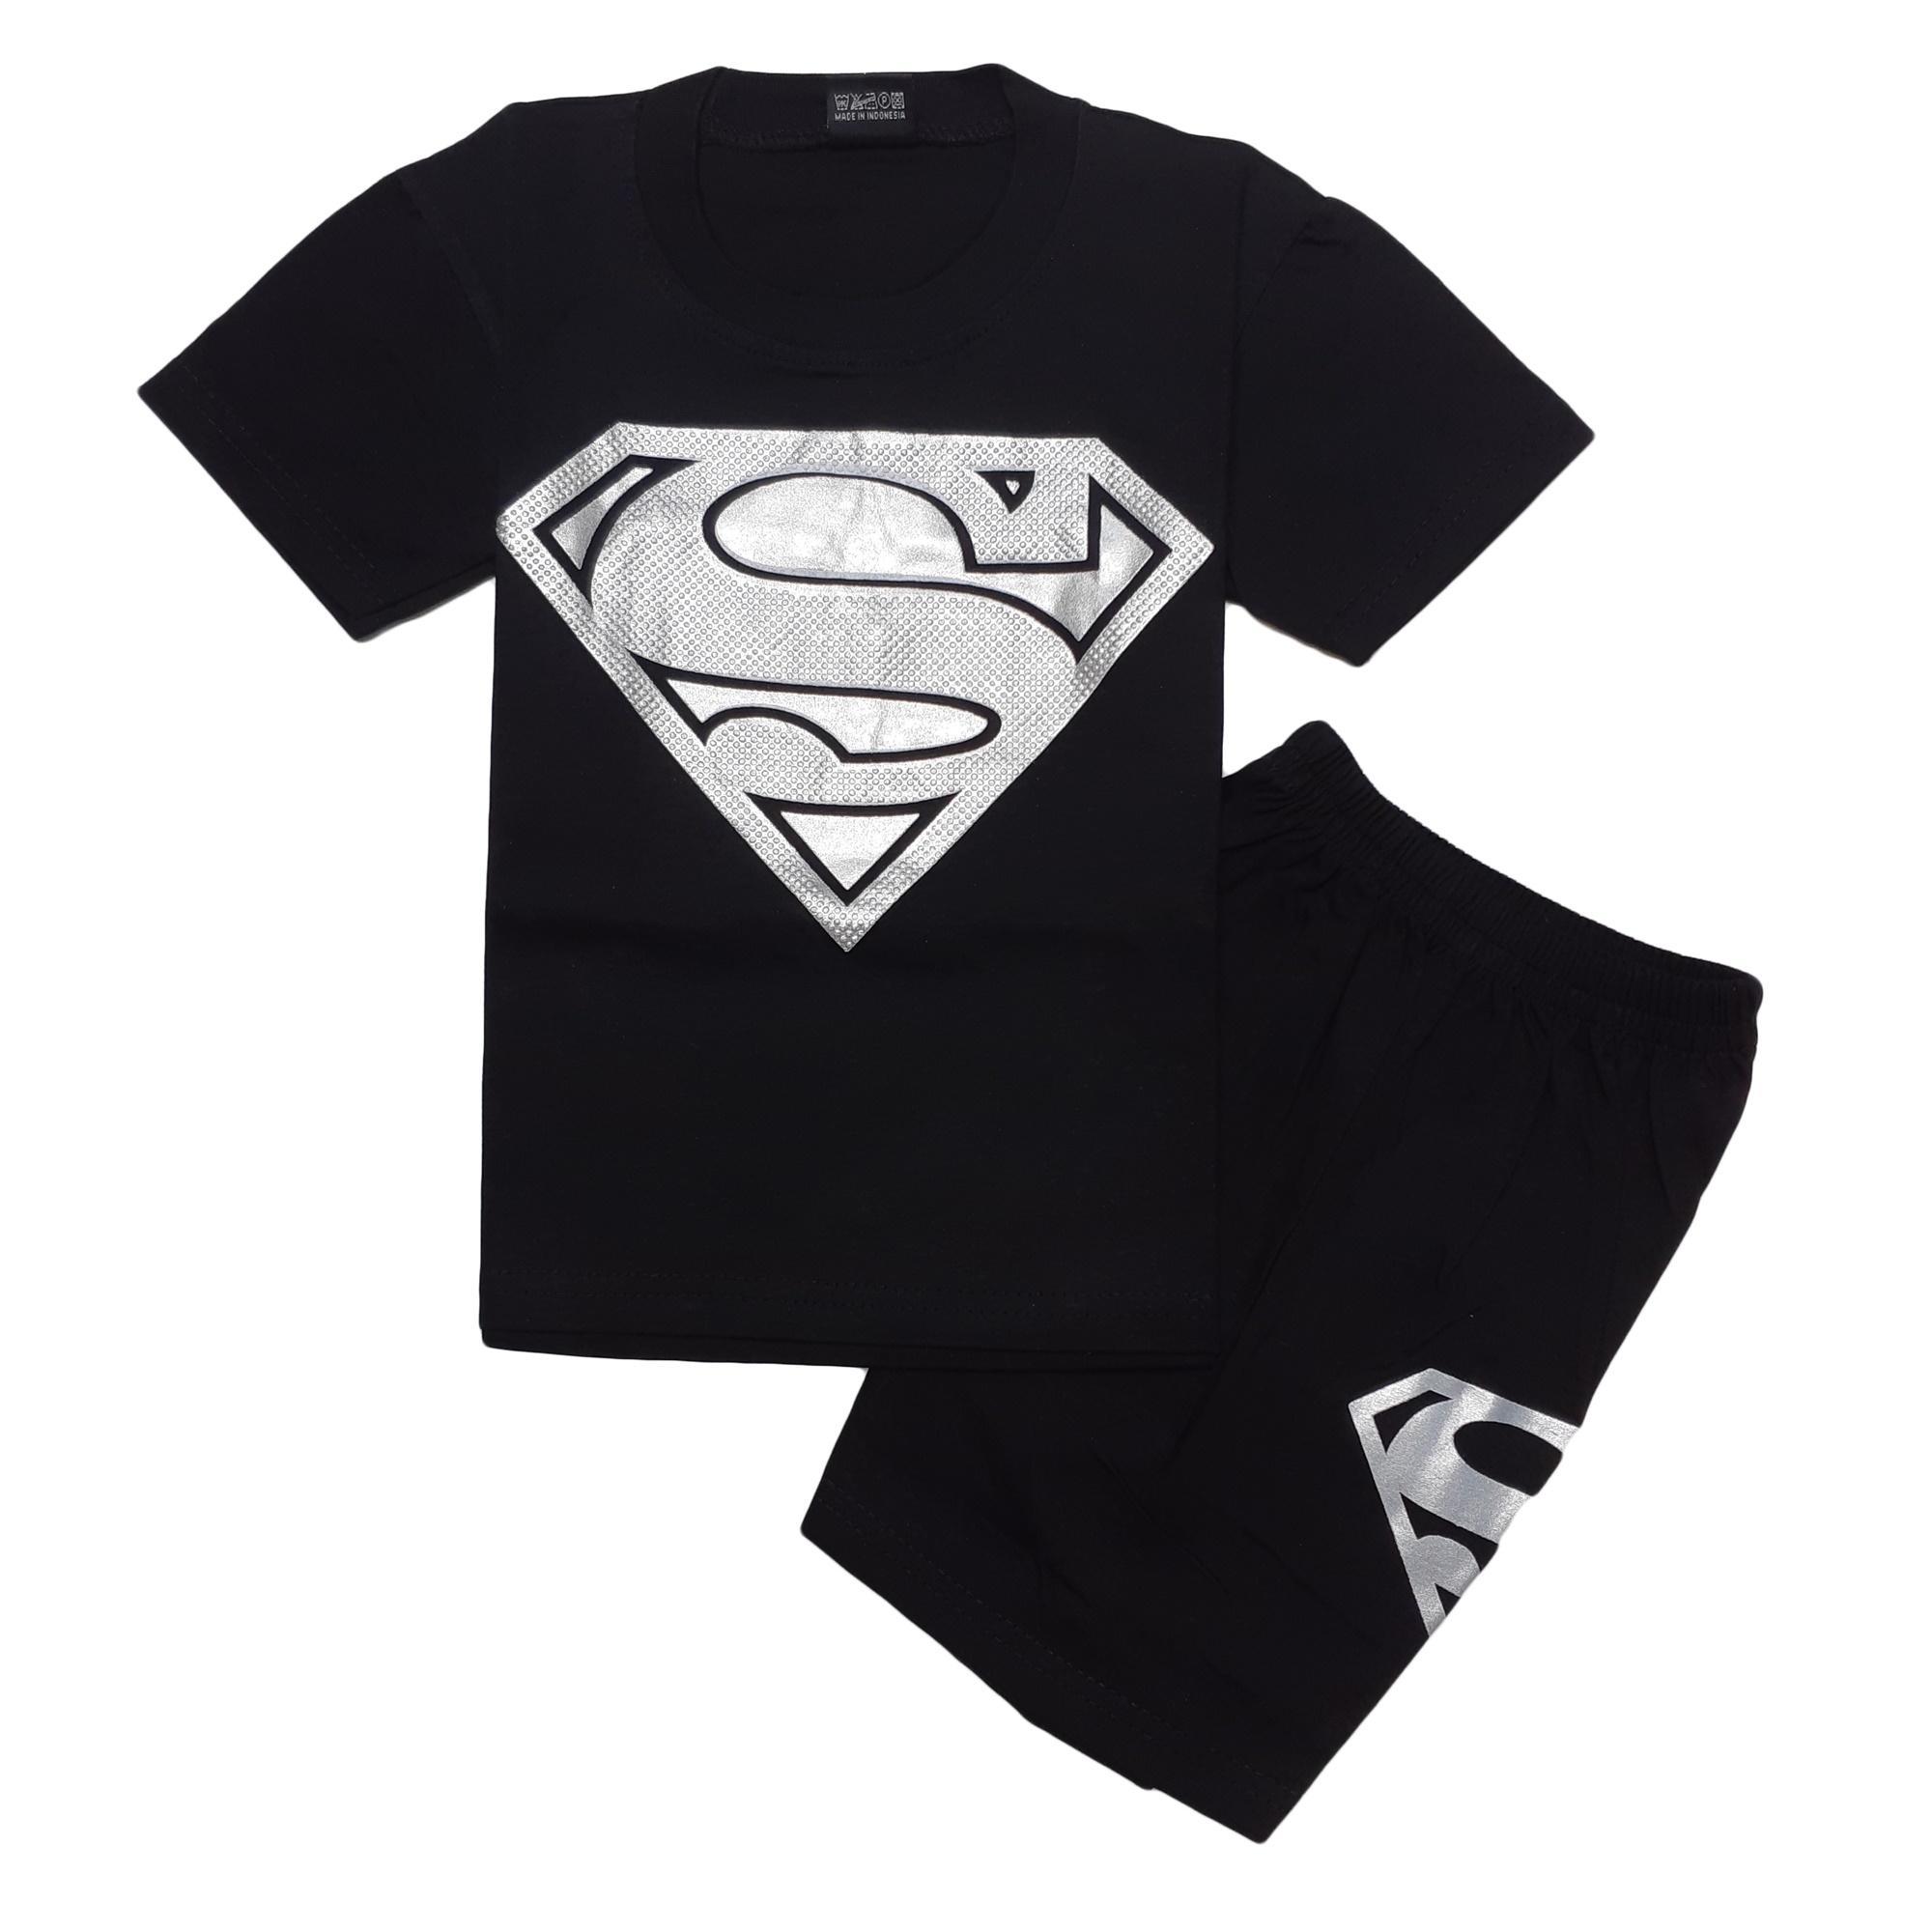 Jual Baju Atasan Anak Laki Kaos Singlet Pria Superhero